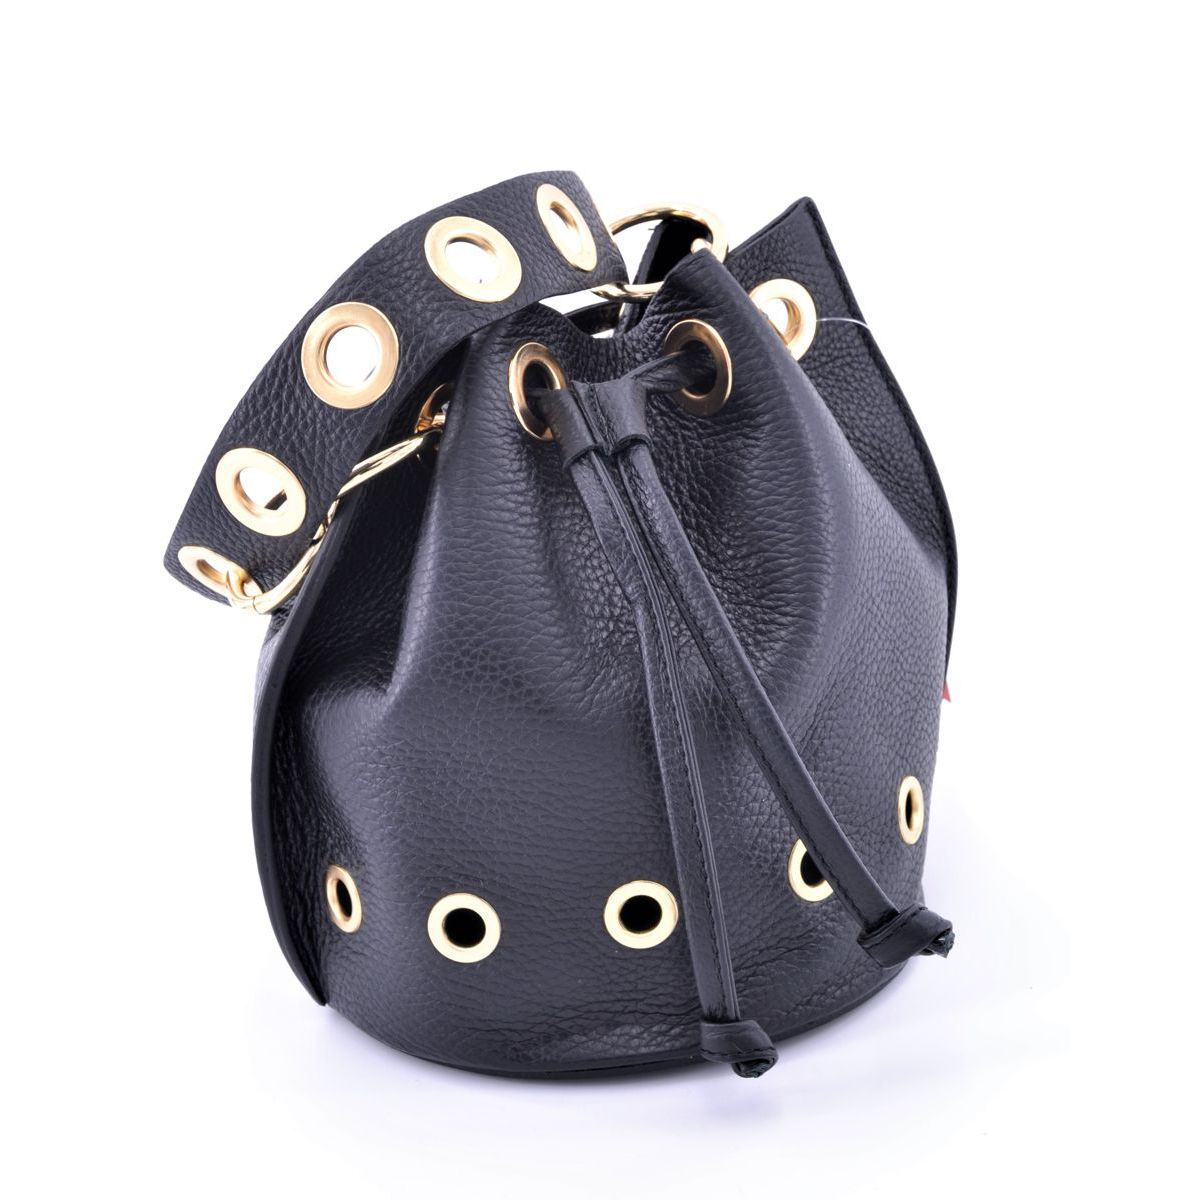 Mini leather bucket with shoulder strap Black BRASS Workshop